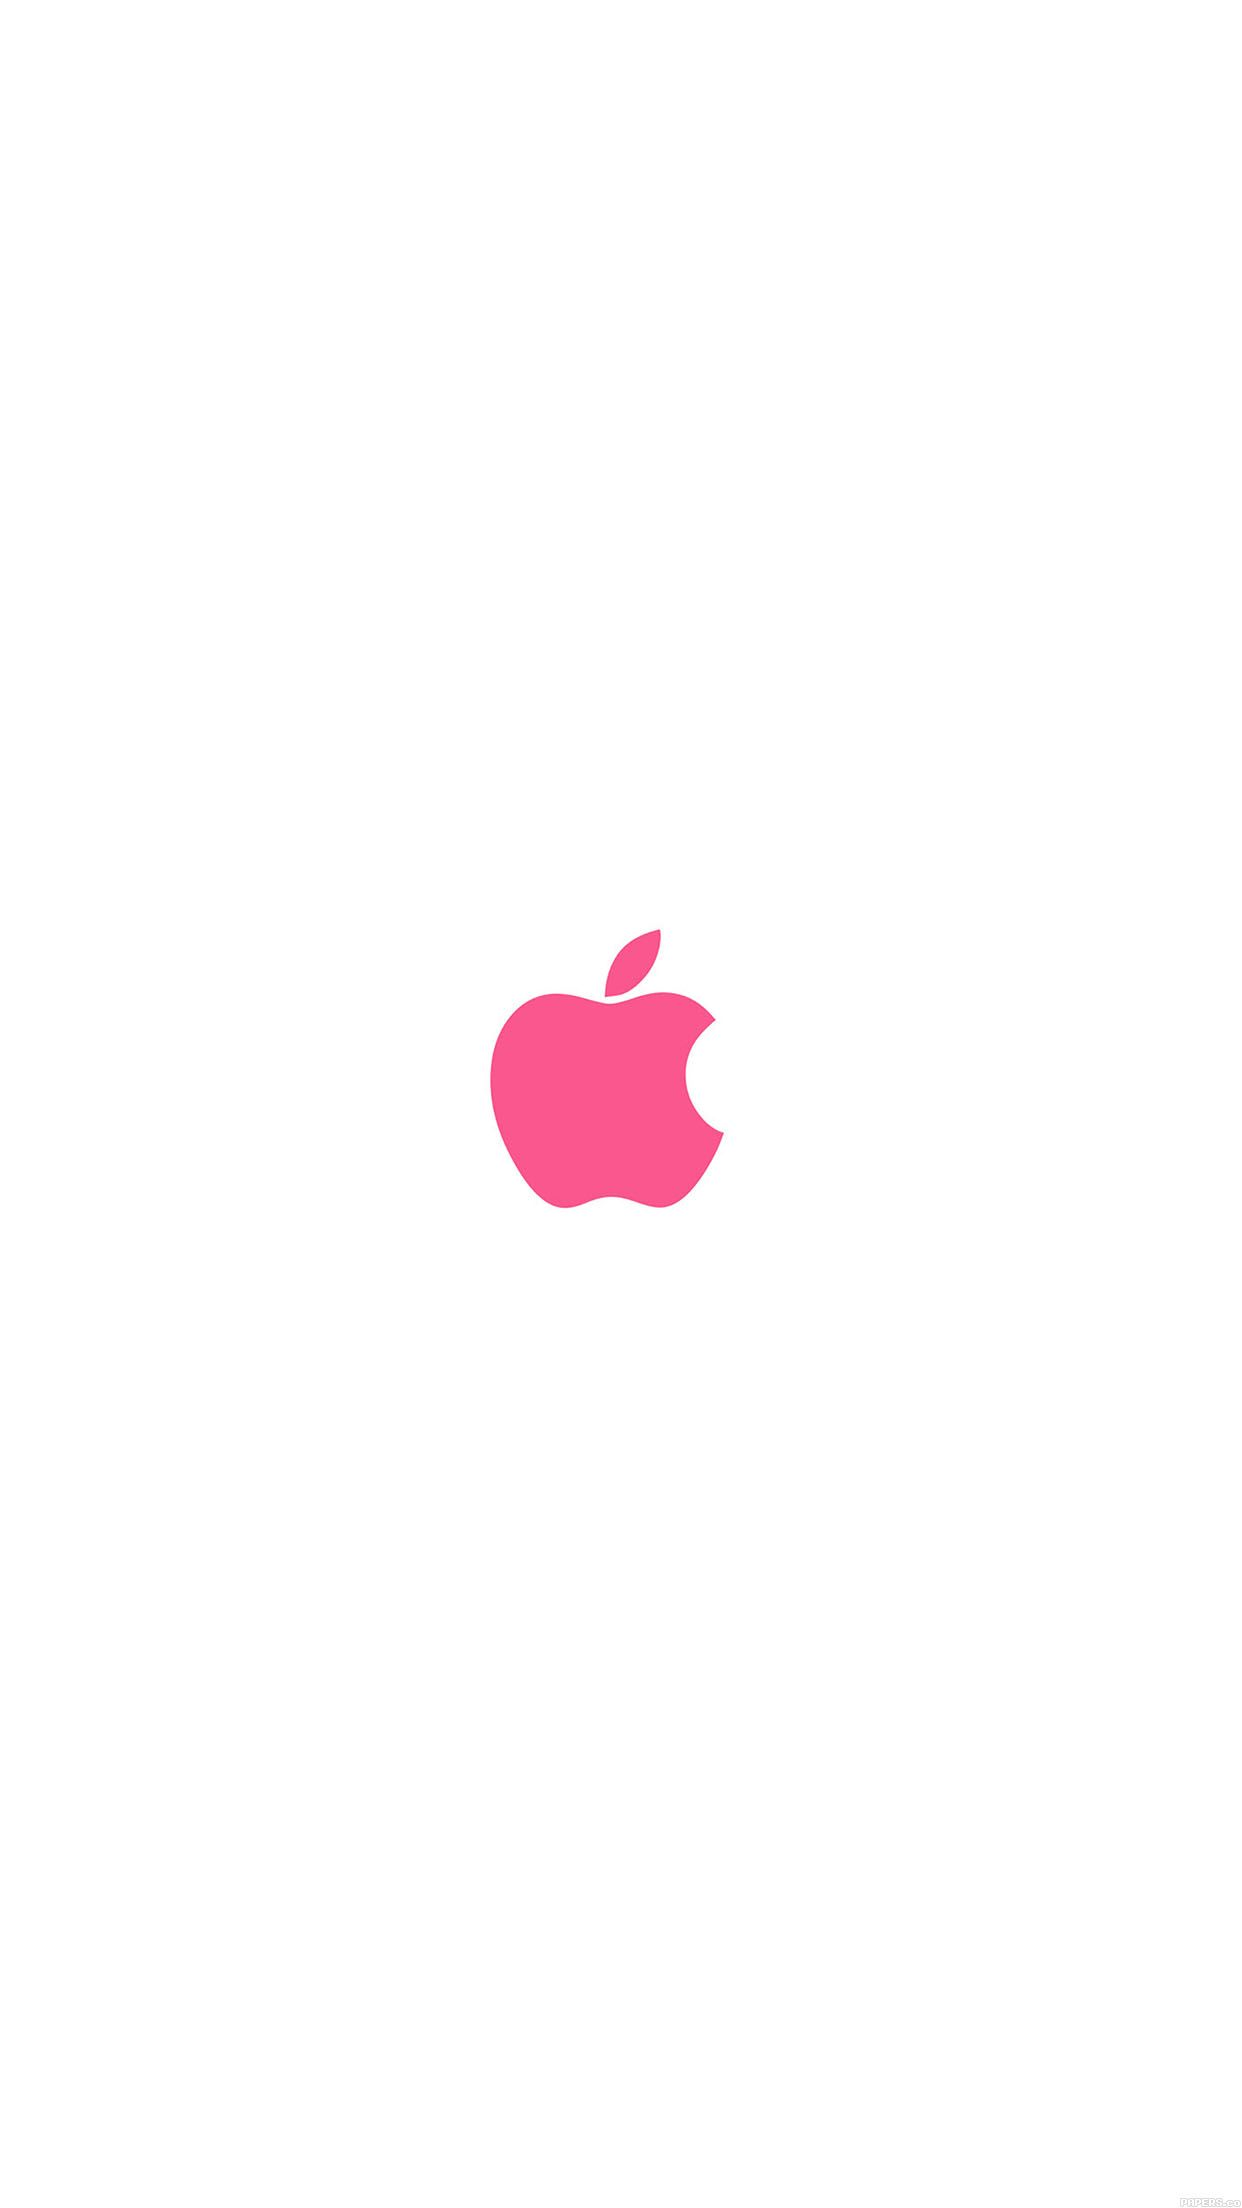 Apple Logo Color Red Minimal Apple Logo Wallpaper Iphone Apple